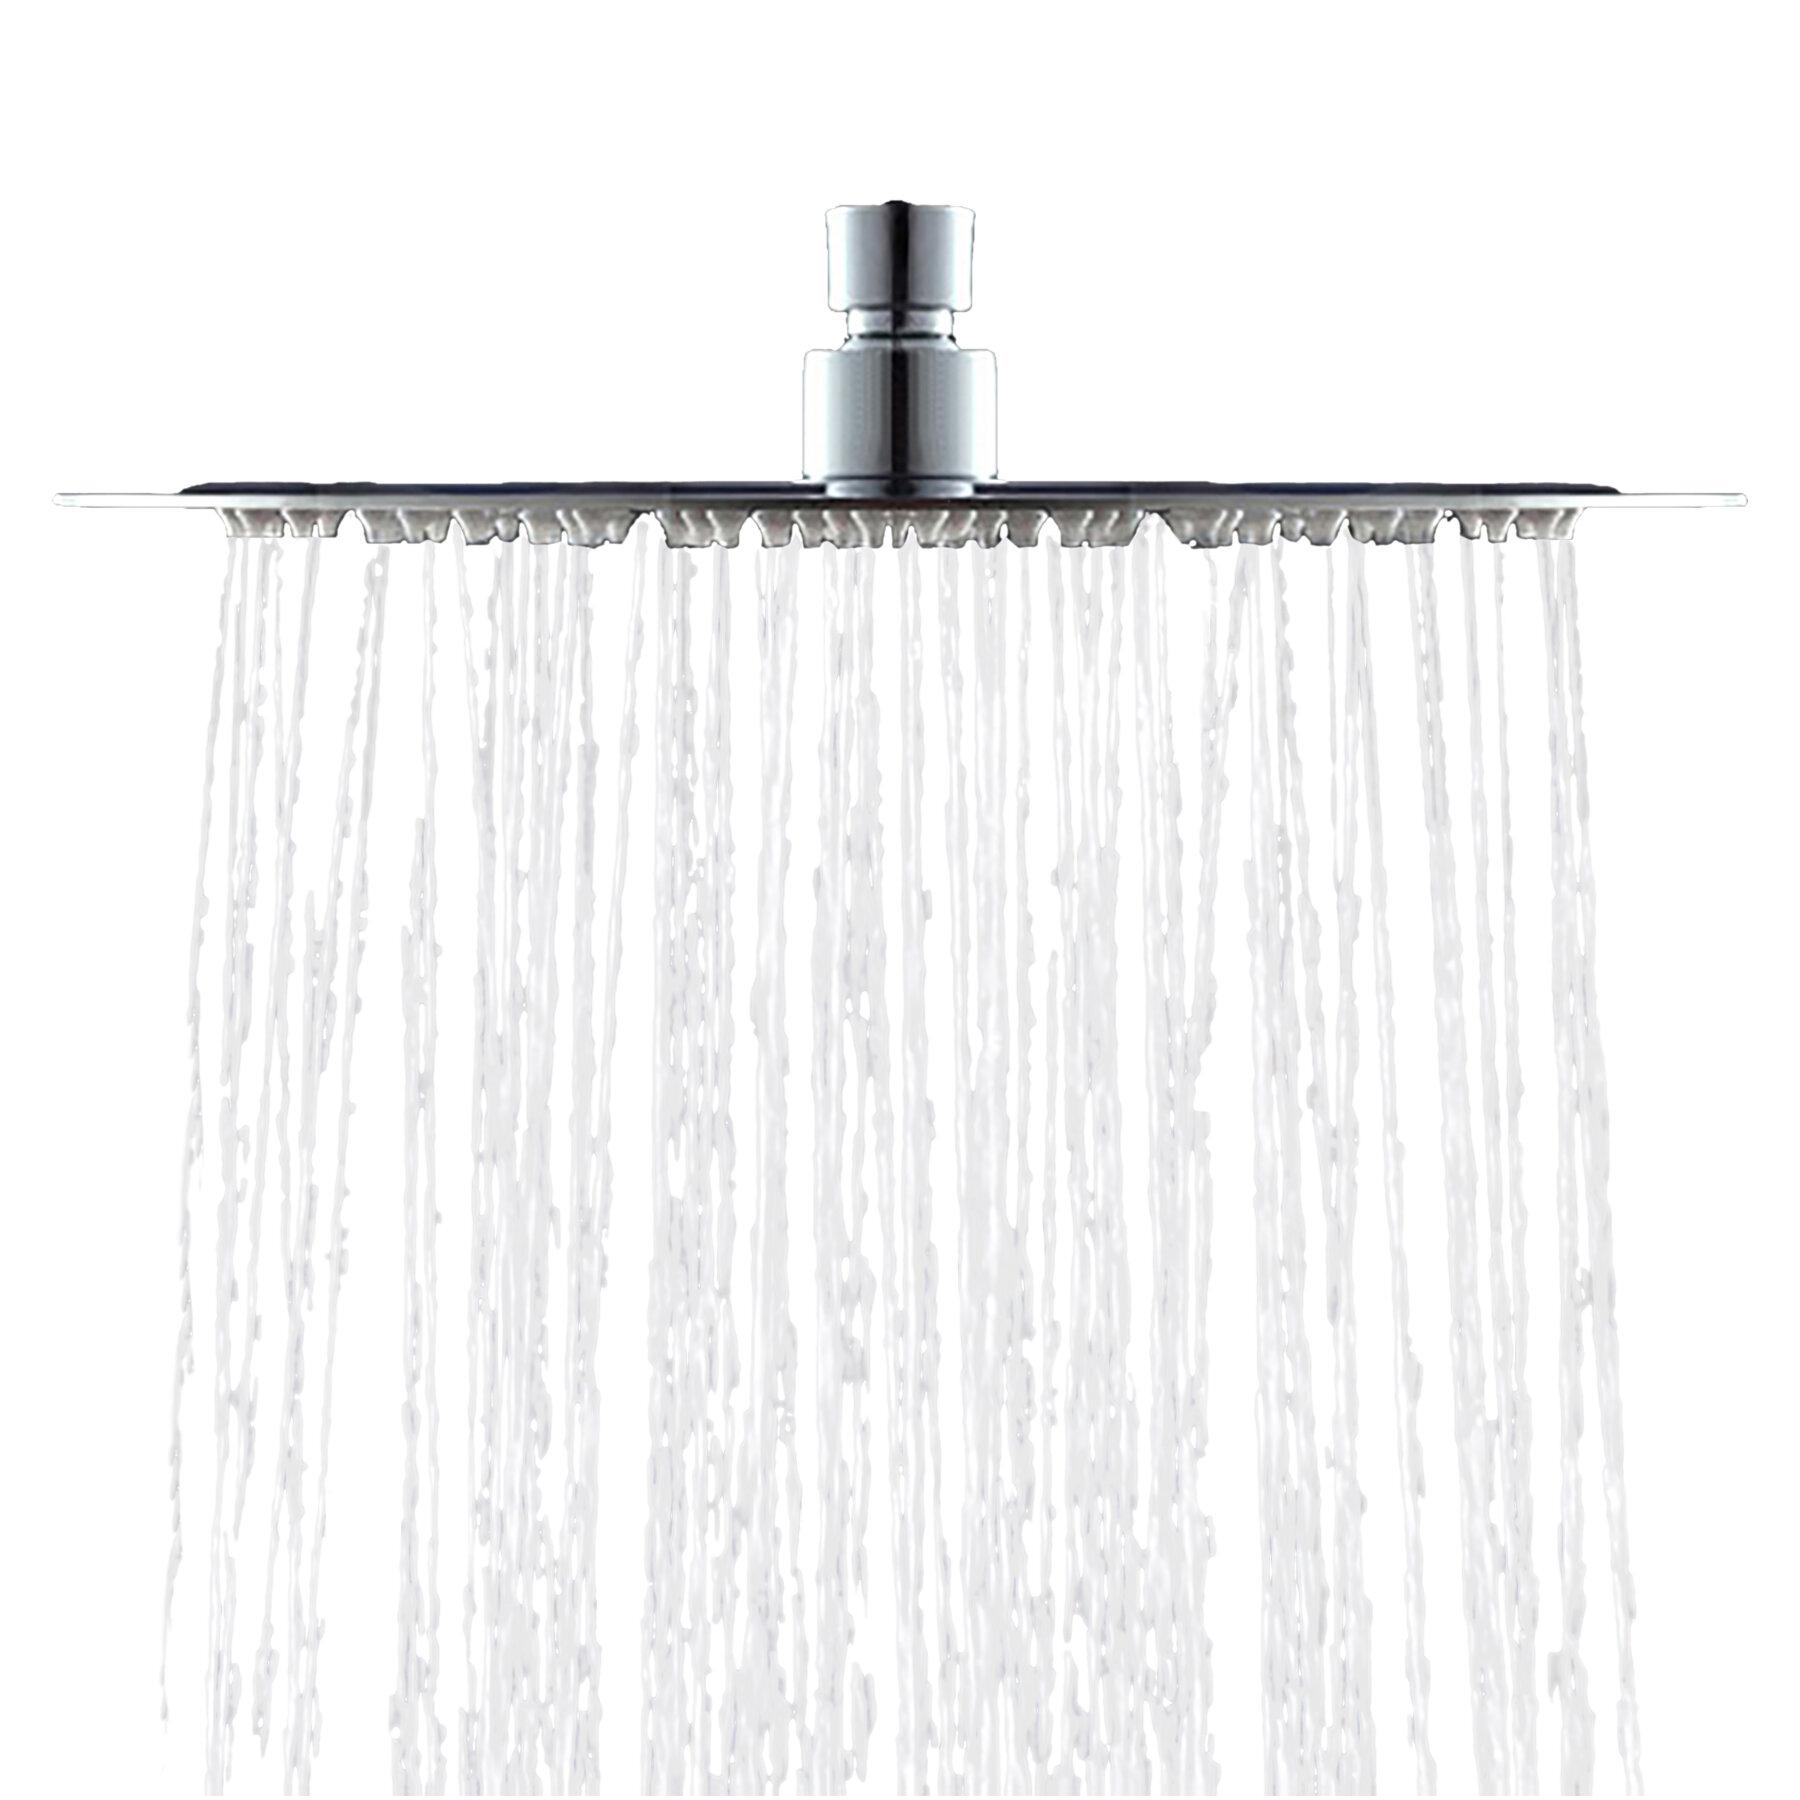 AKDY Round Single Spray Rain Adjustable Shower Head | Wayfair